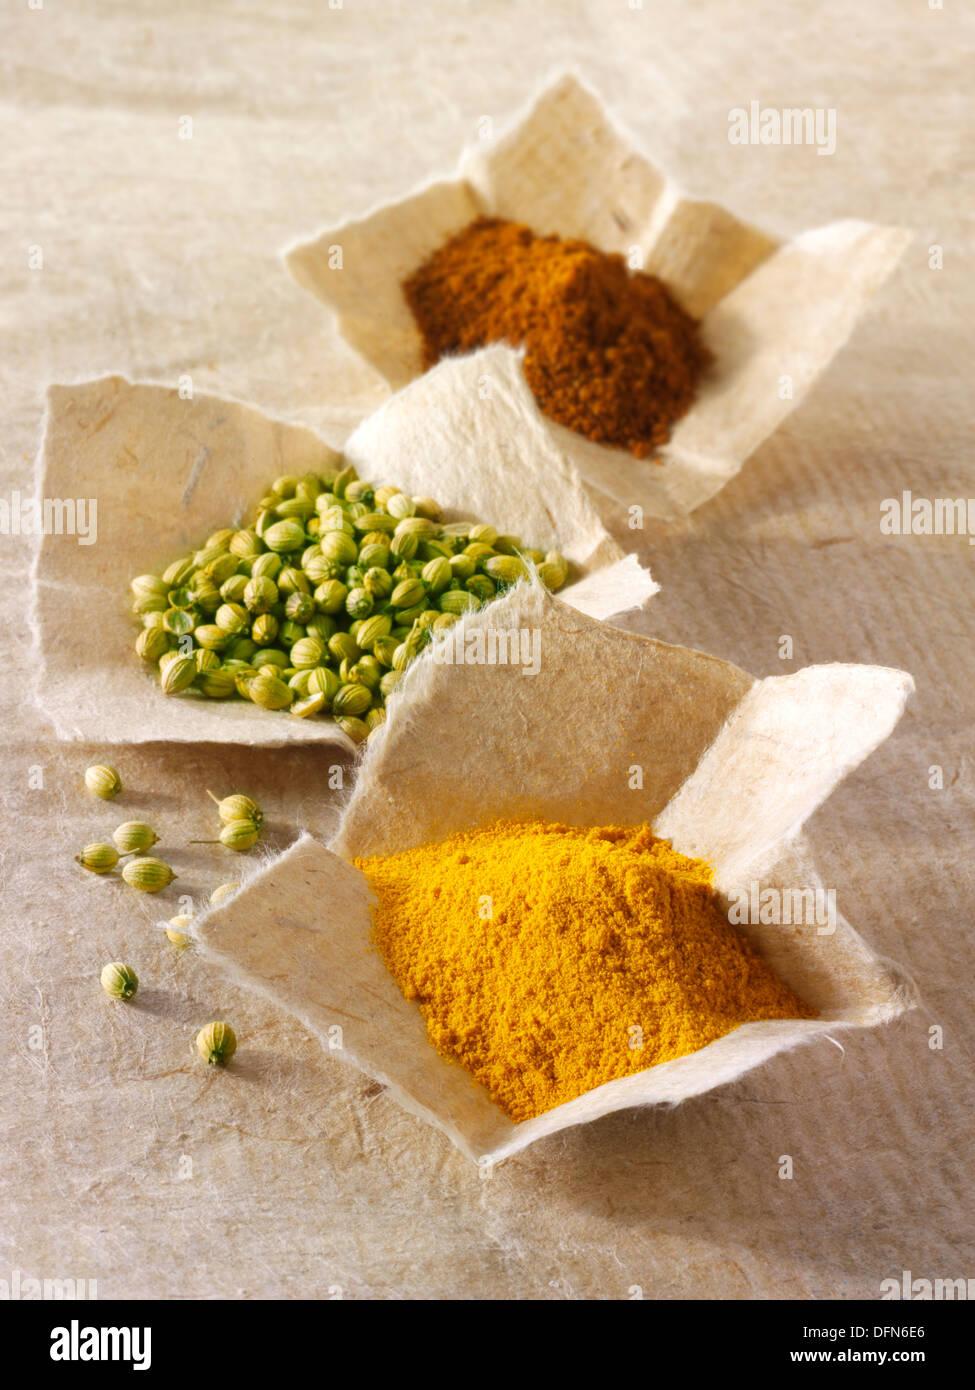 Coriander seed, ground chilli powder & ground turmeric spices - Stock Image